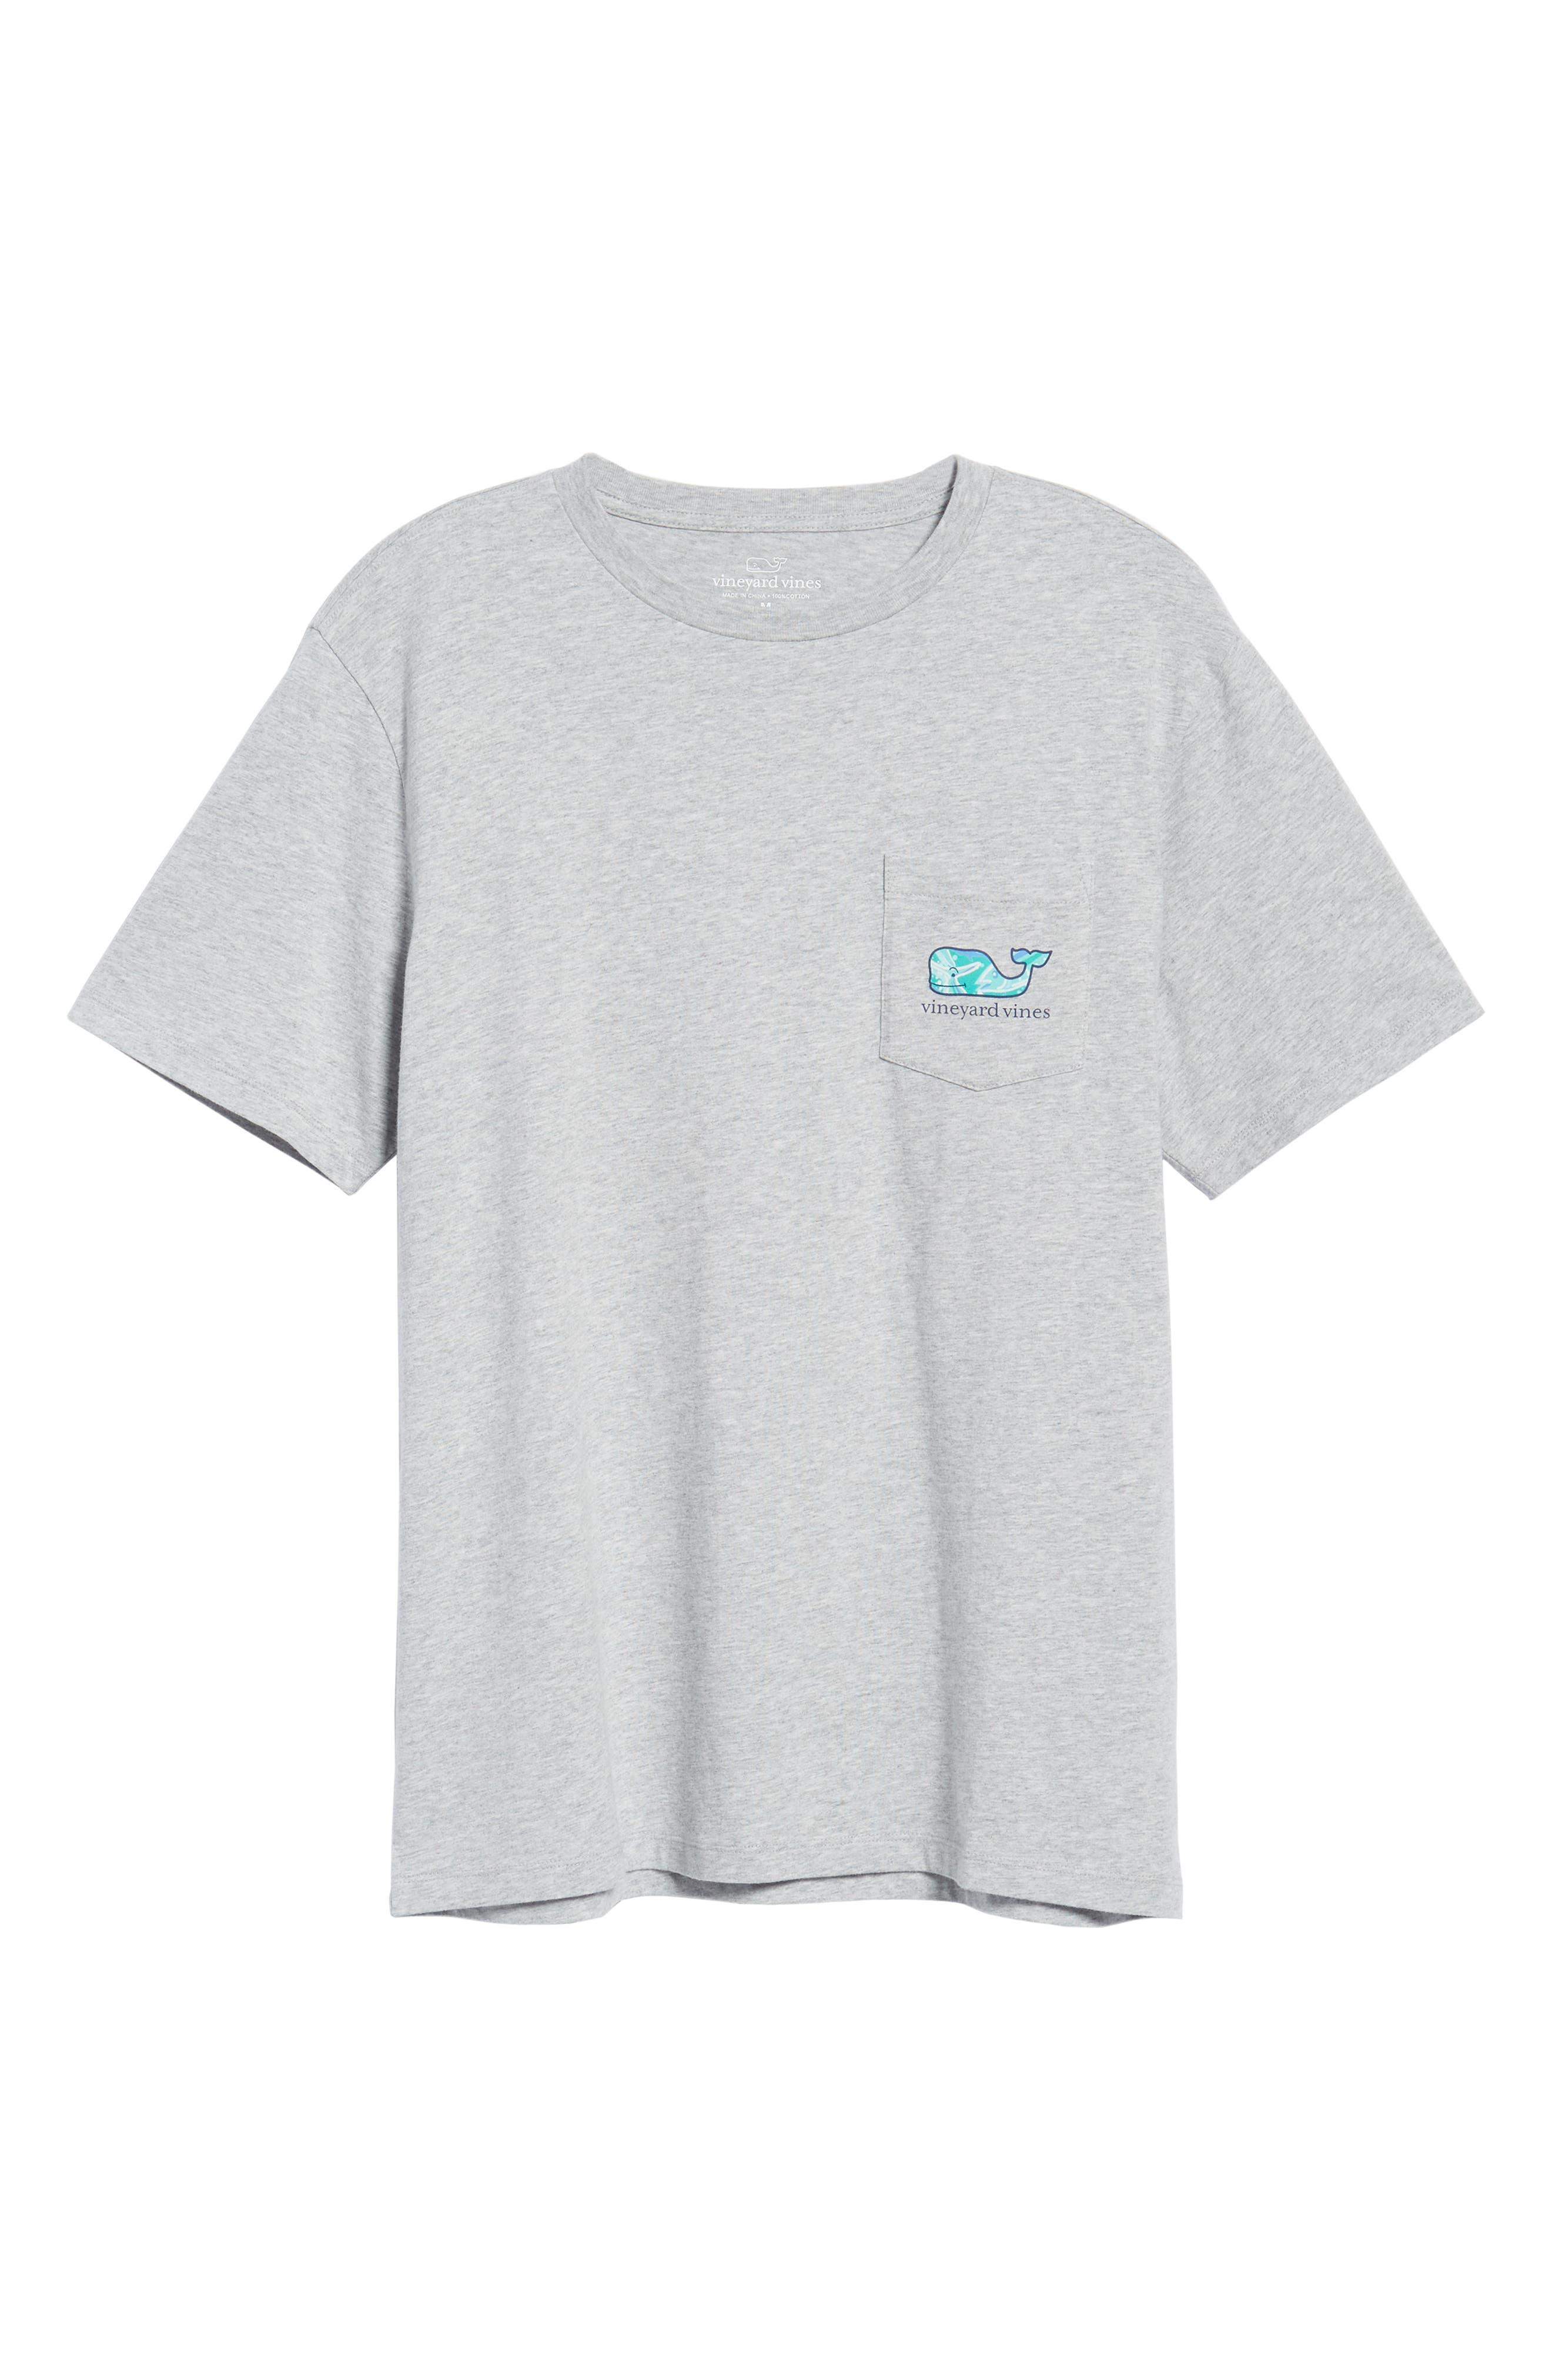 School of Tuna Regular Fit Pocket T-Shirt,                             Alternate thumbnail 6, color,                             Gray Heather